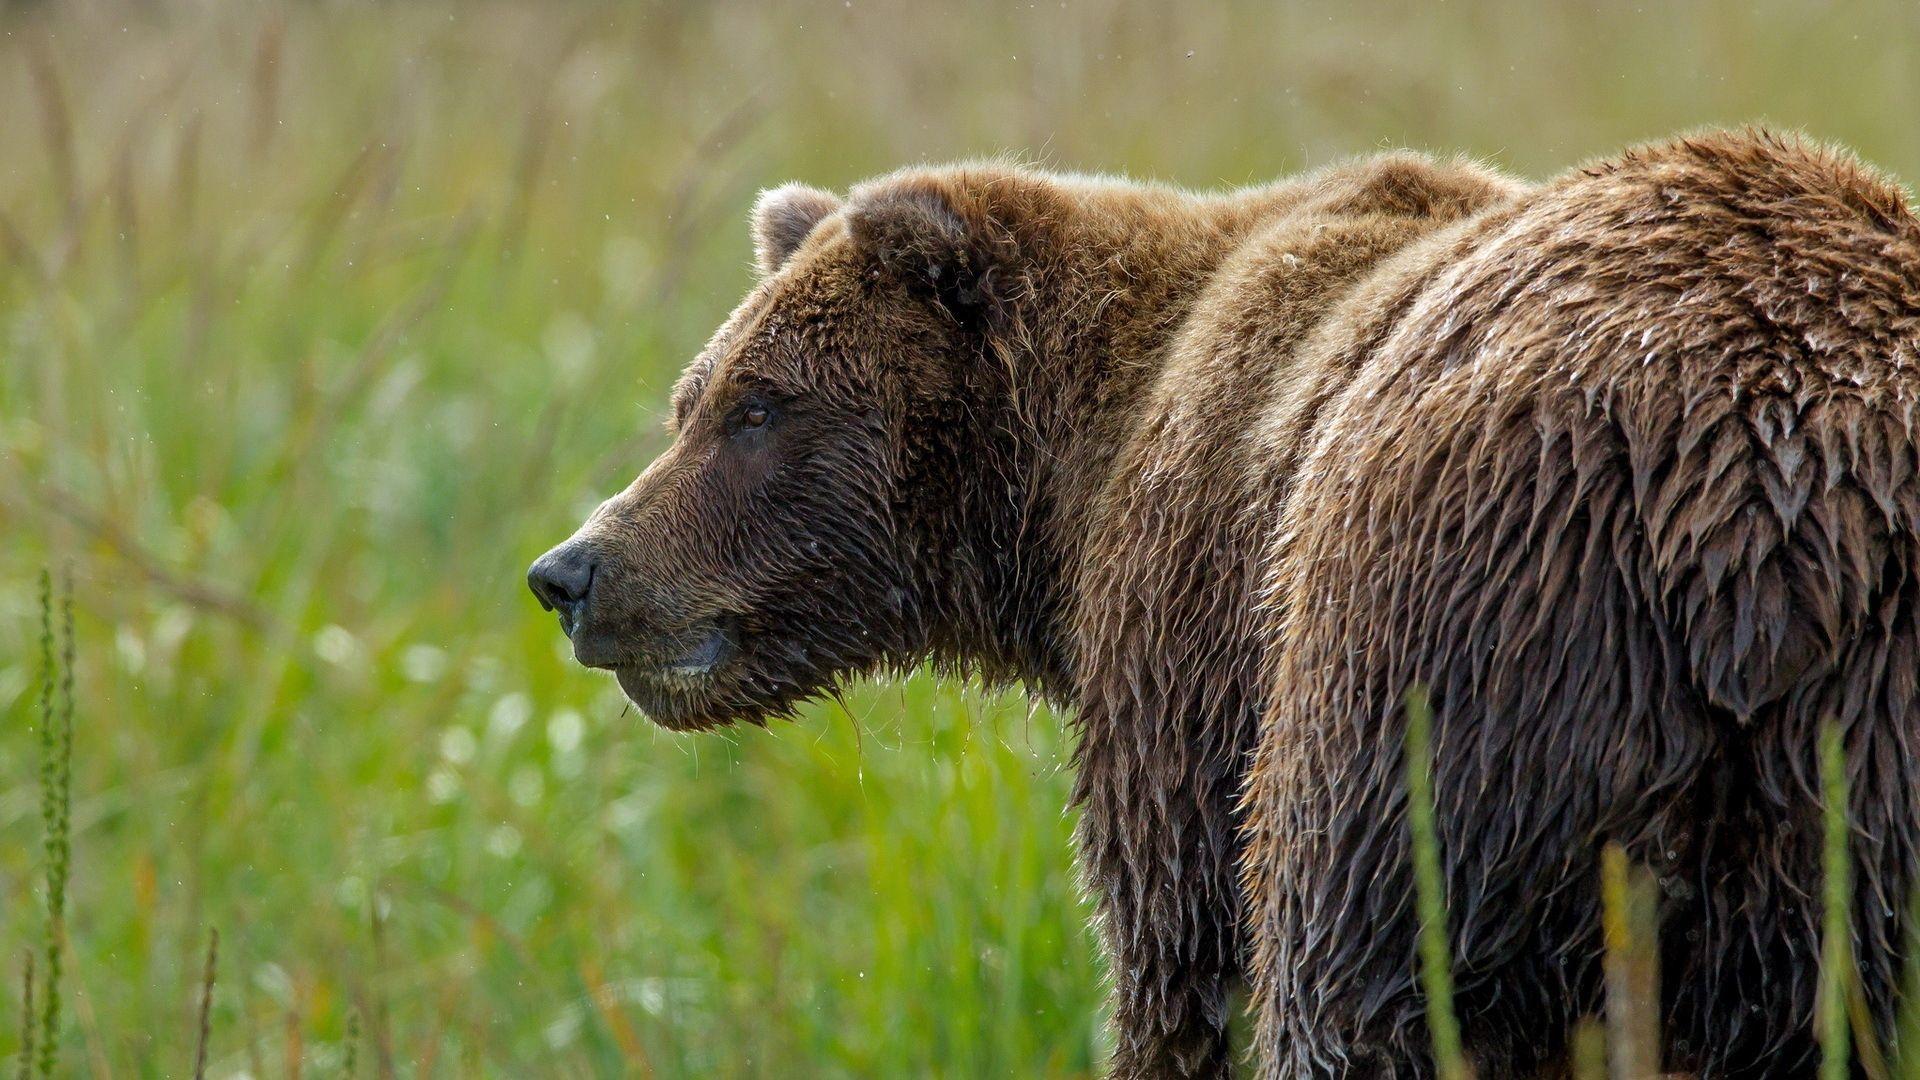 Bears Brown Water Wet Animal bear cub baby wallpaper x